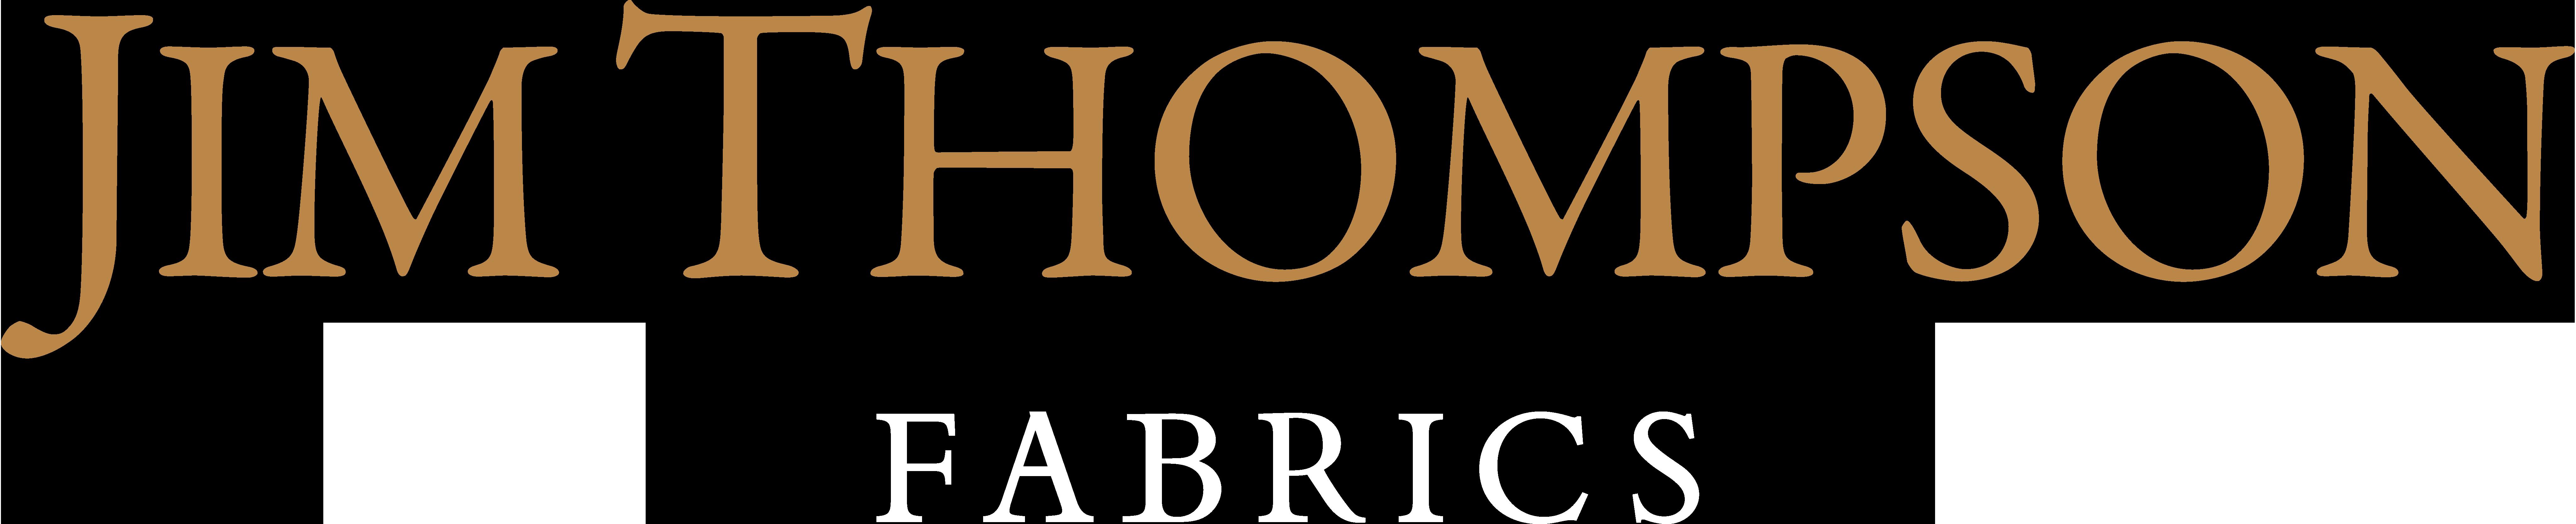 Jim Thompson Fabrics: Official Site - Jim Thompson Fabrics